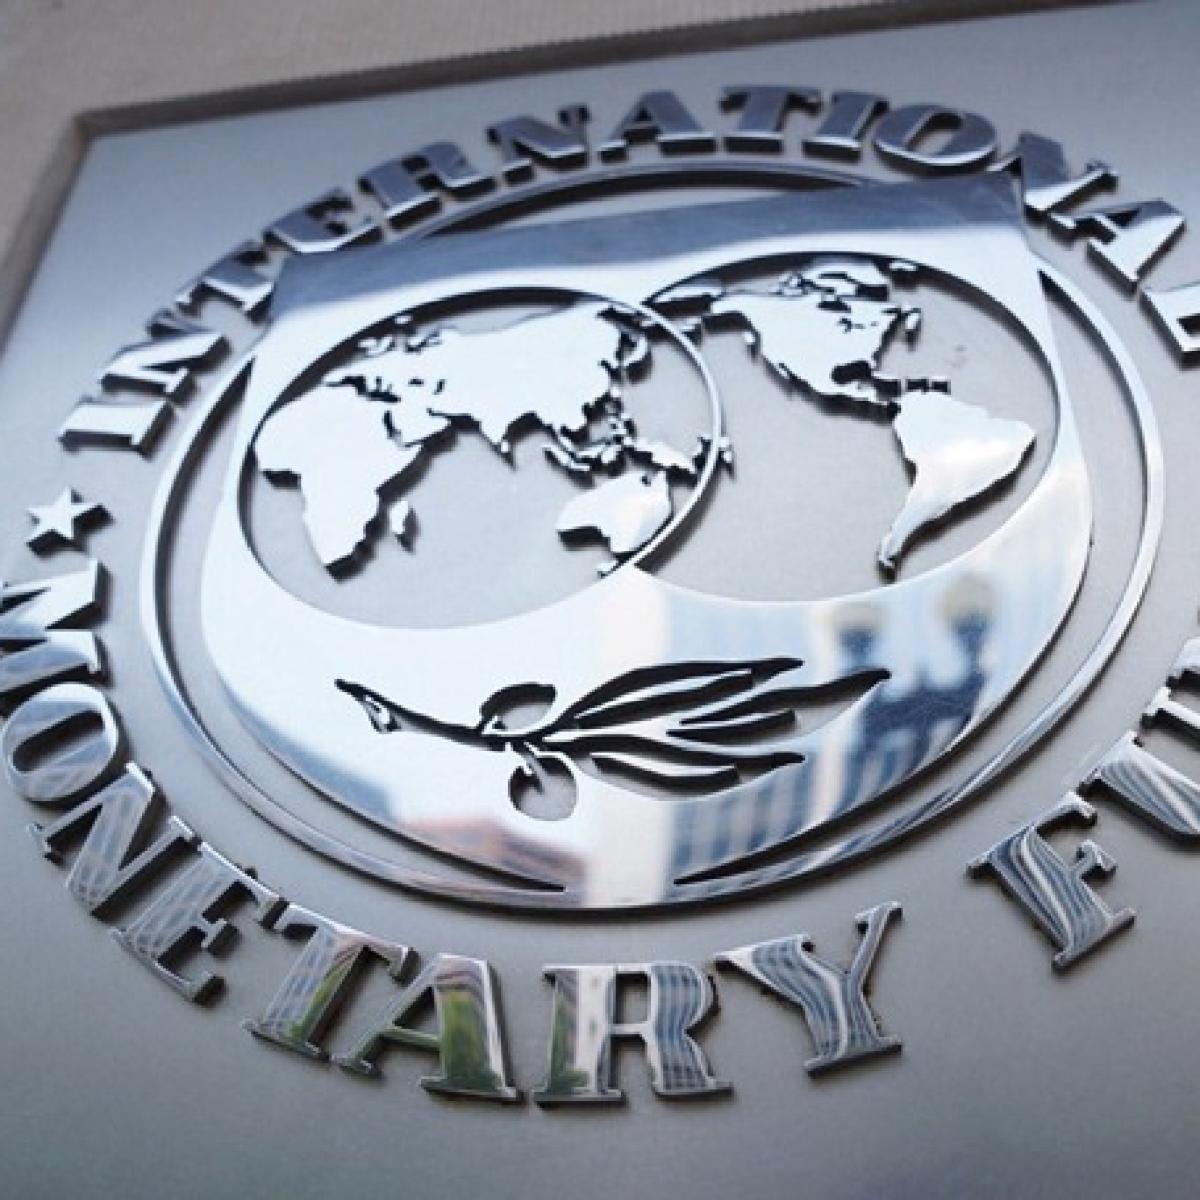 Global growth to dip below' last year's rate: IMF